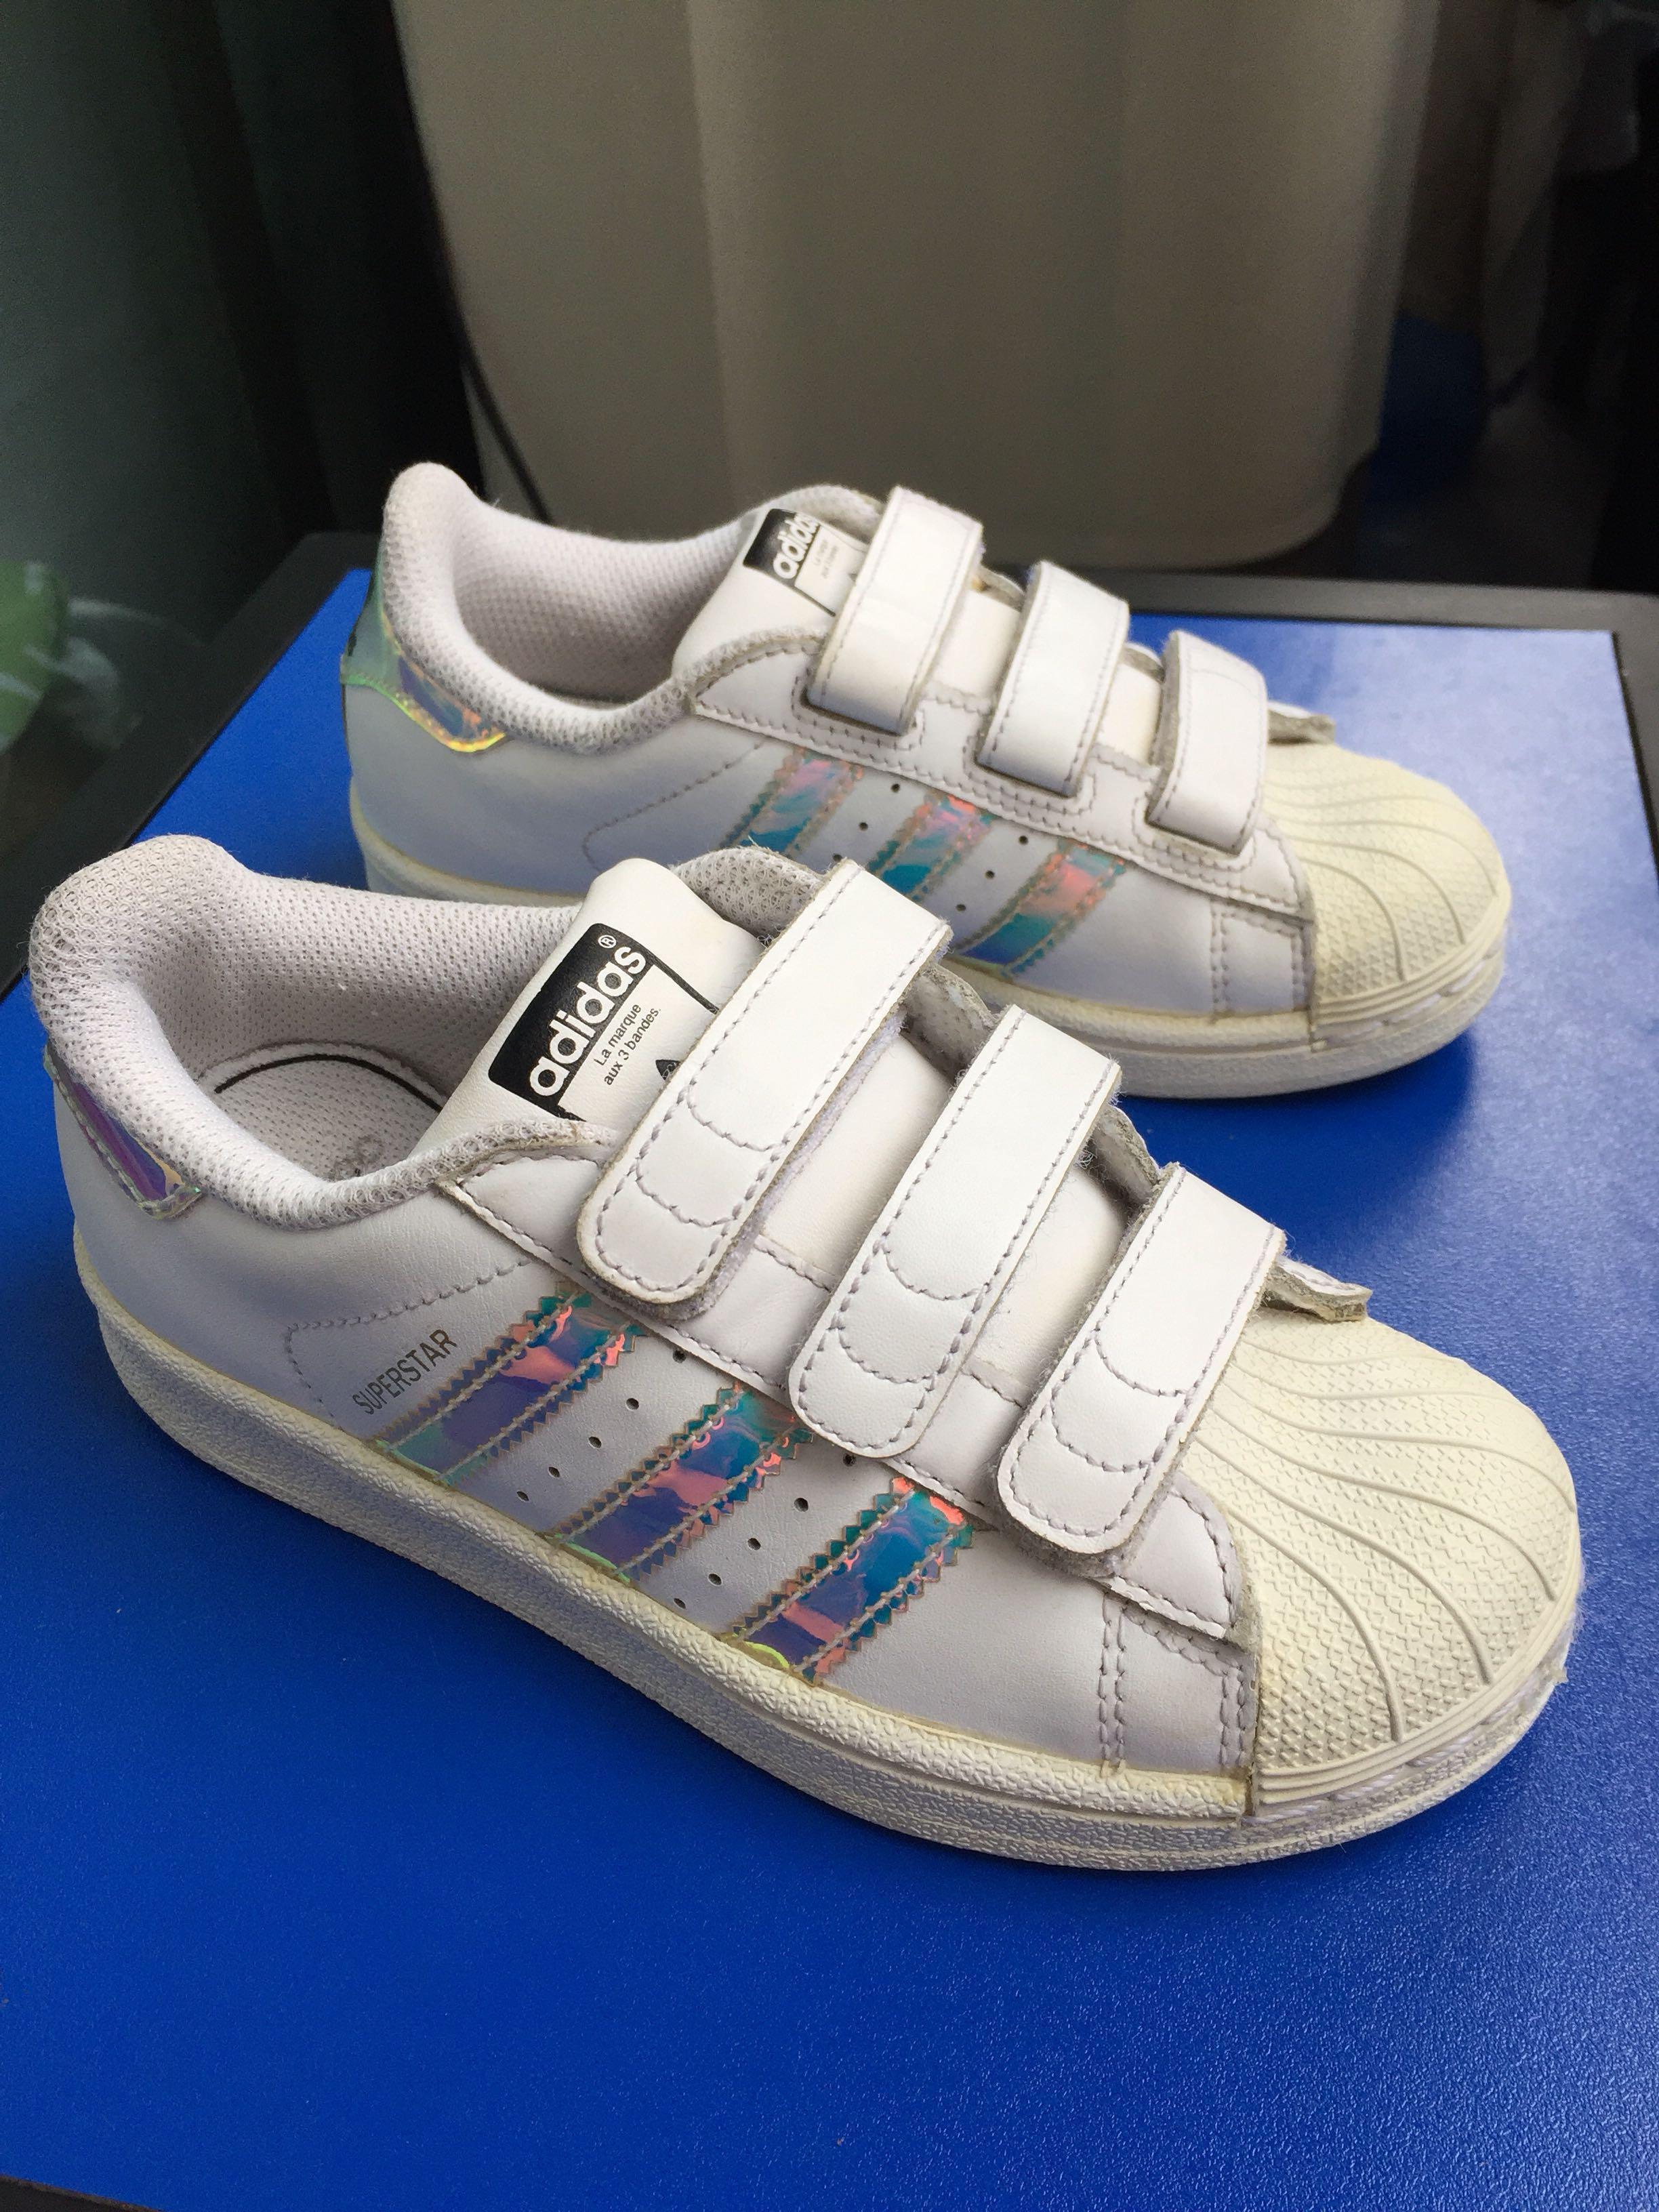 new style 372a1 63f34 ️Repriced‼ Adidas superstar P600 US 12C , Babies   Kids, Boys ...